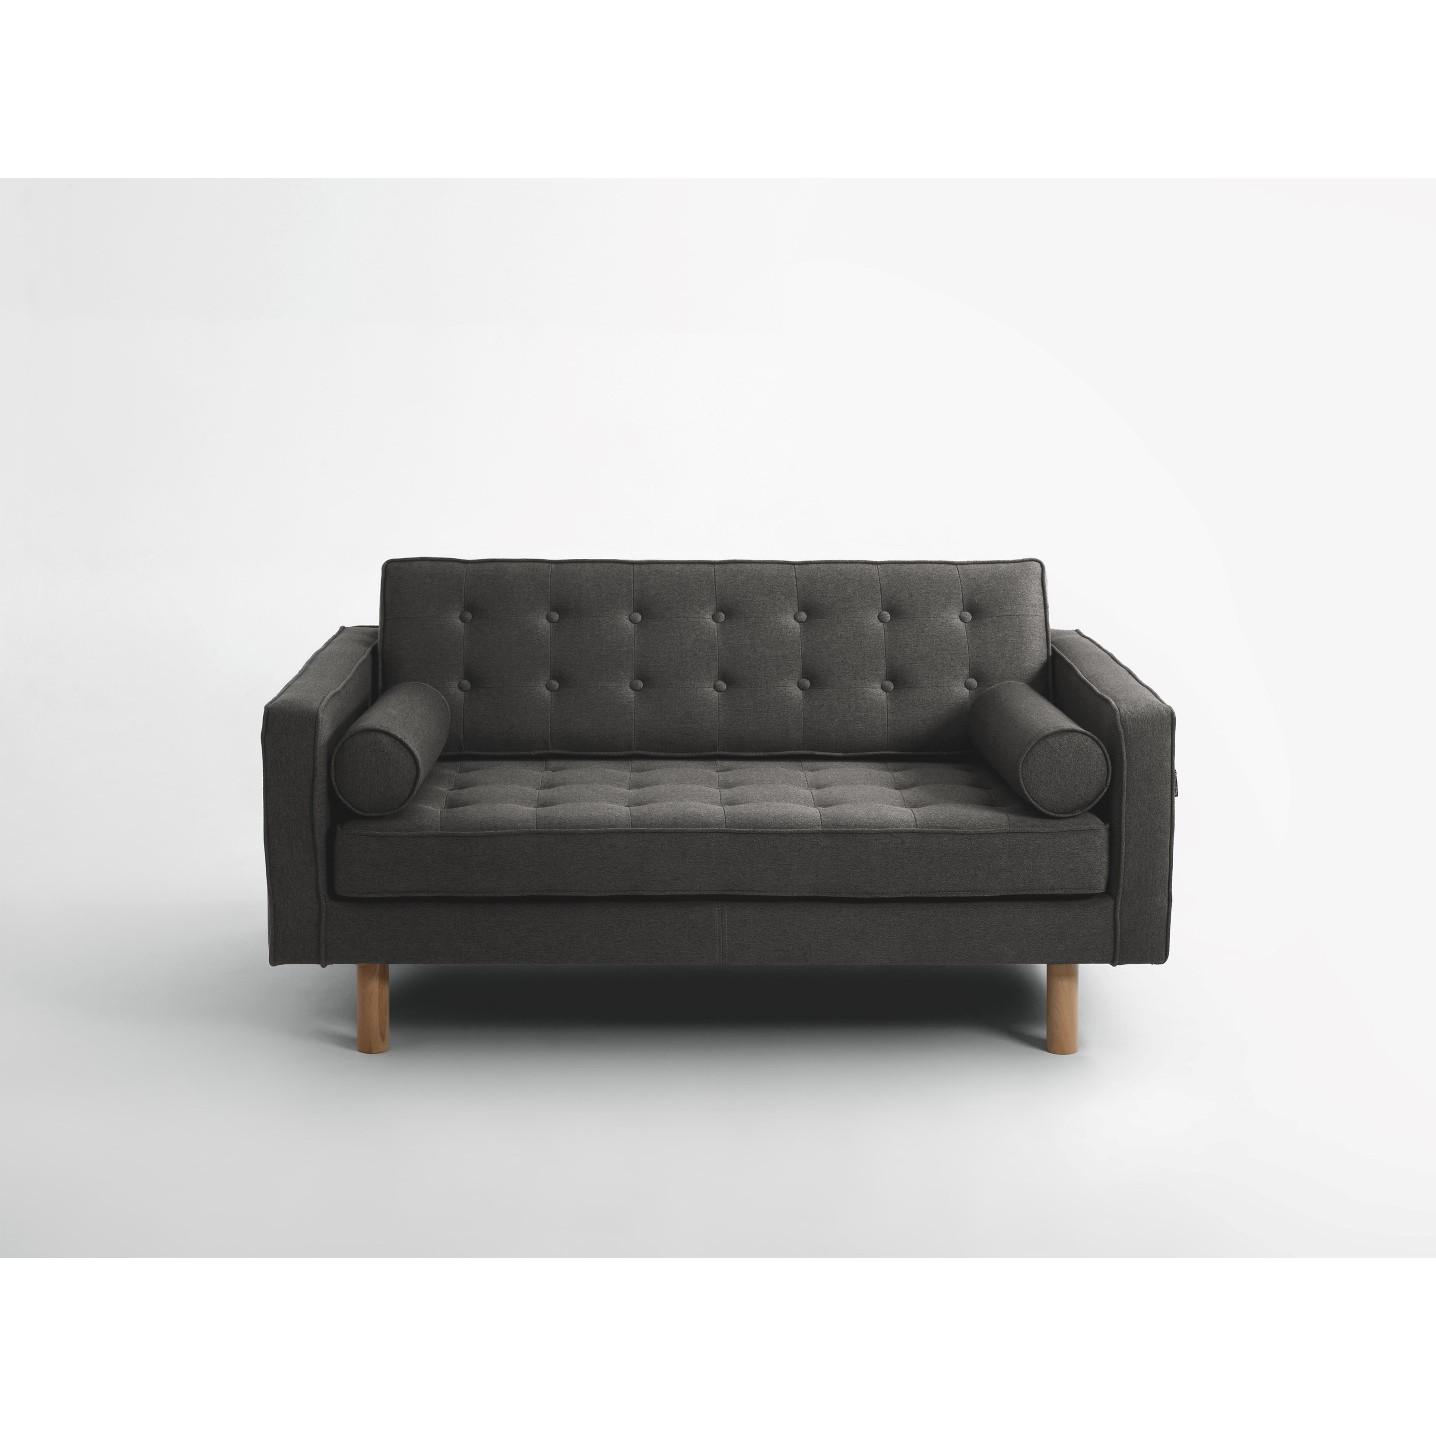 2-Sitzer-Schlafsofa Topic Wood | Stahl